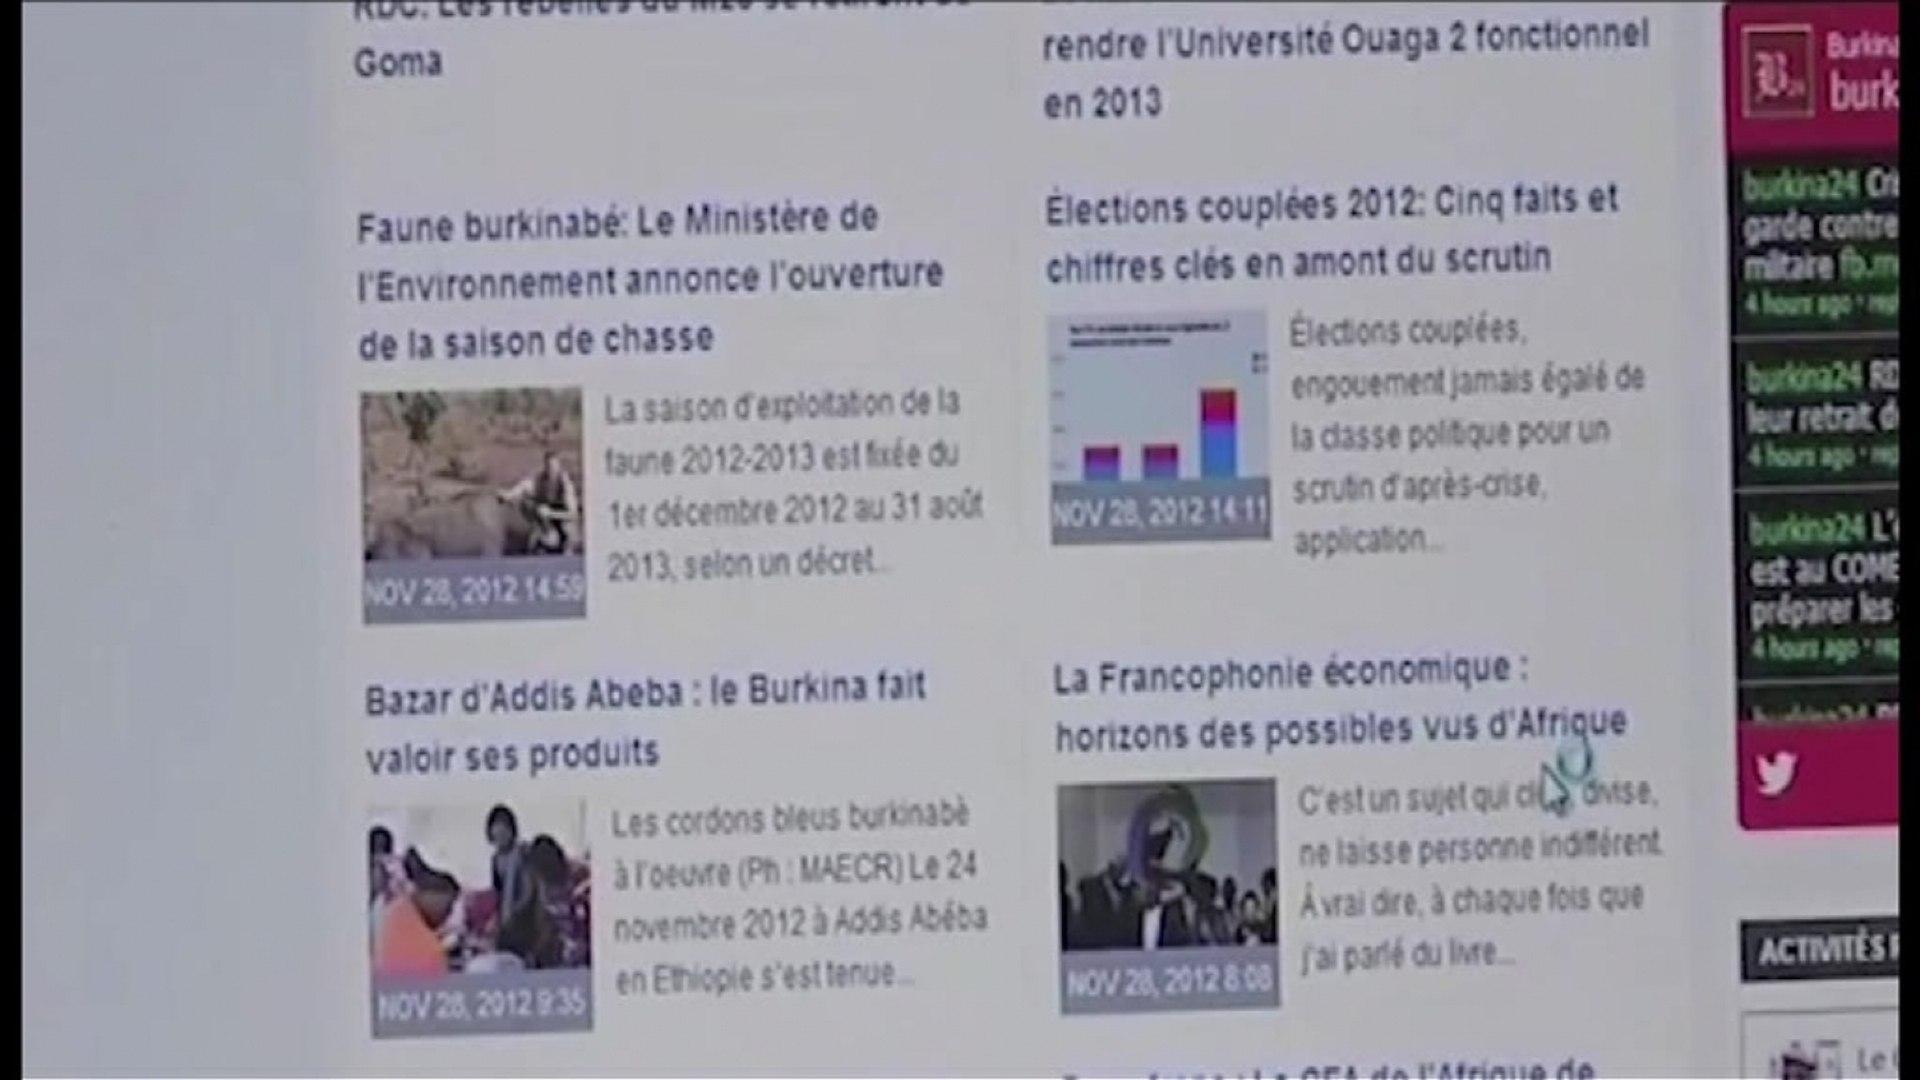 Burkina faso, Subvention de l'Etat à la presse